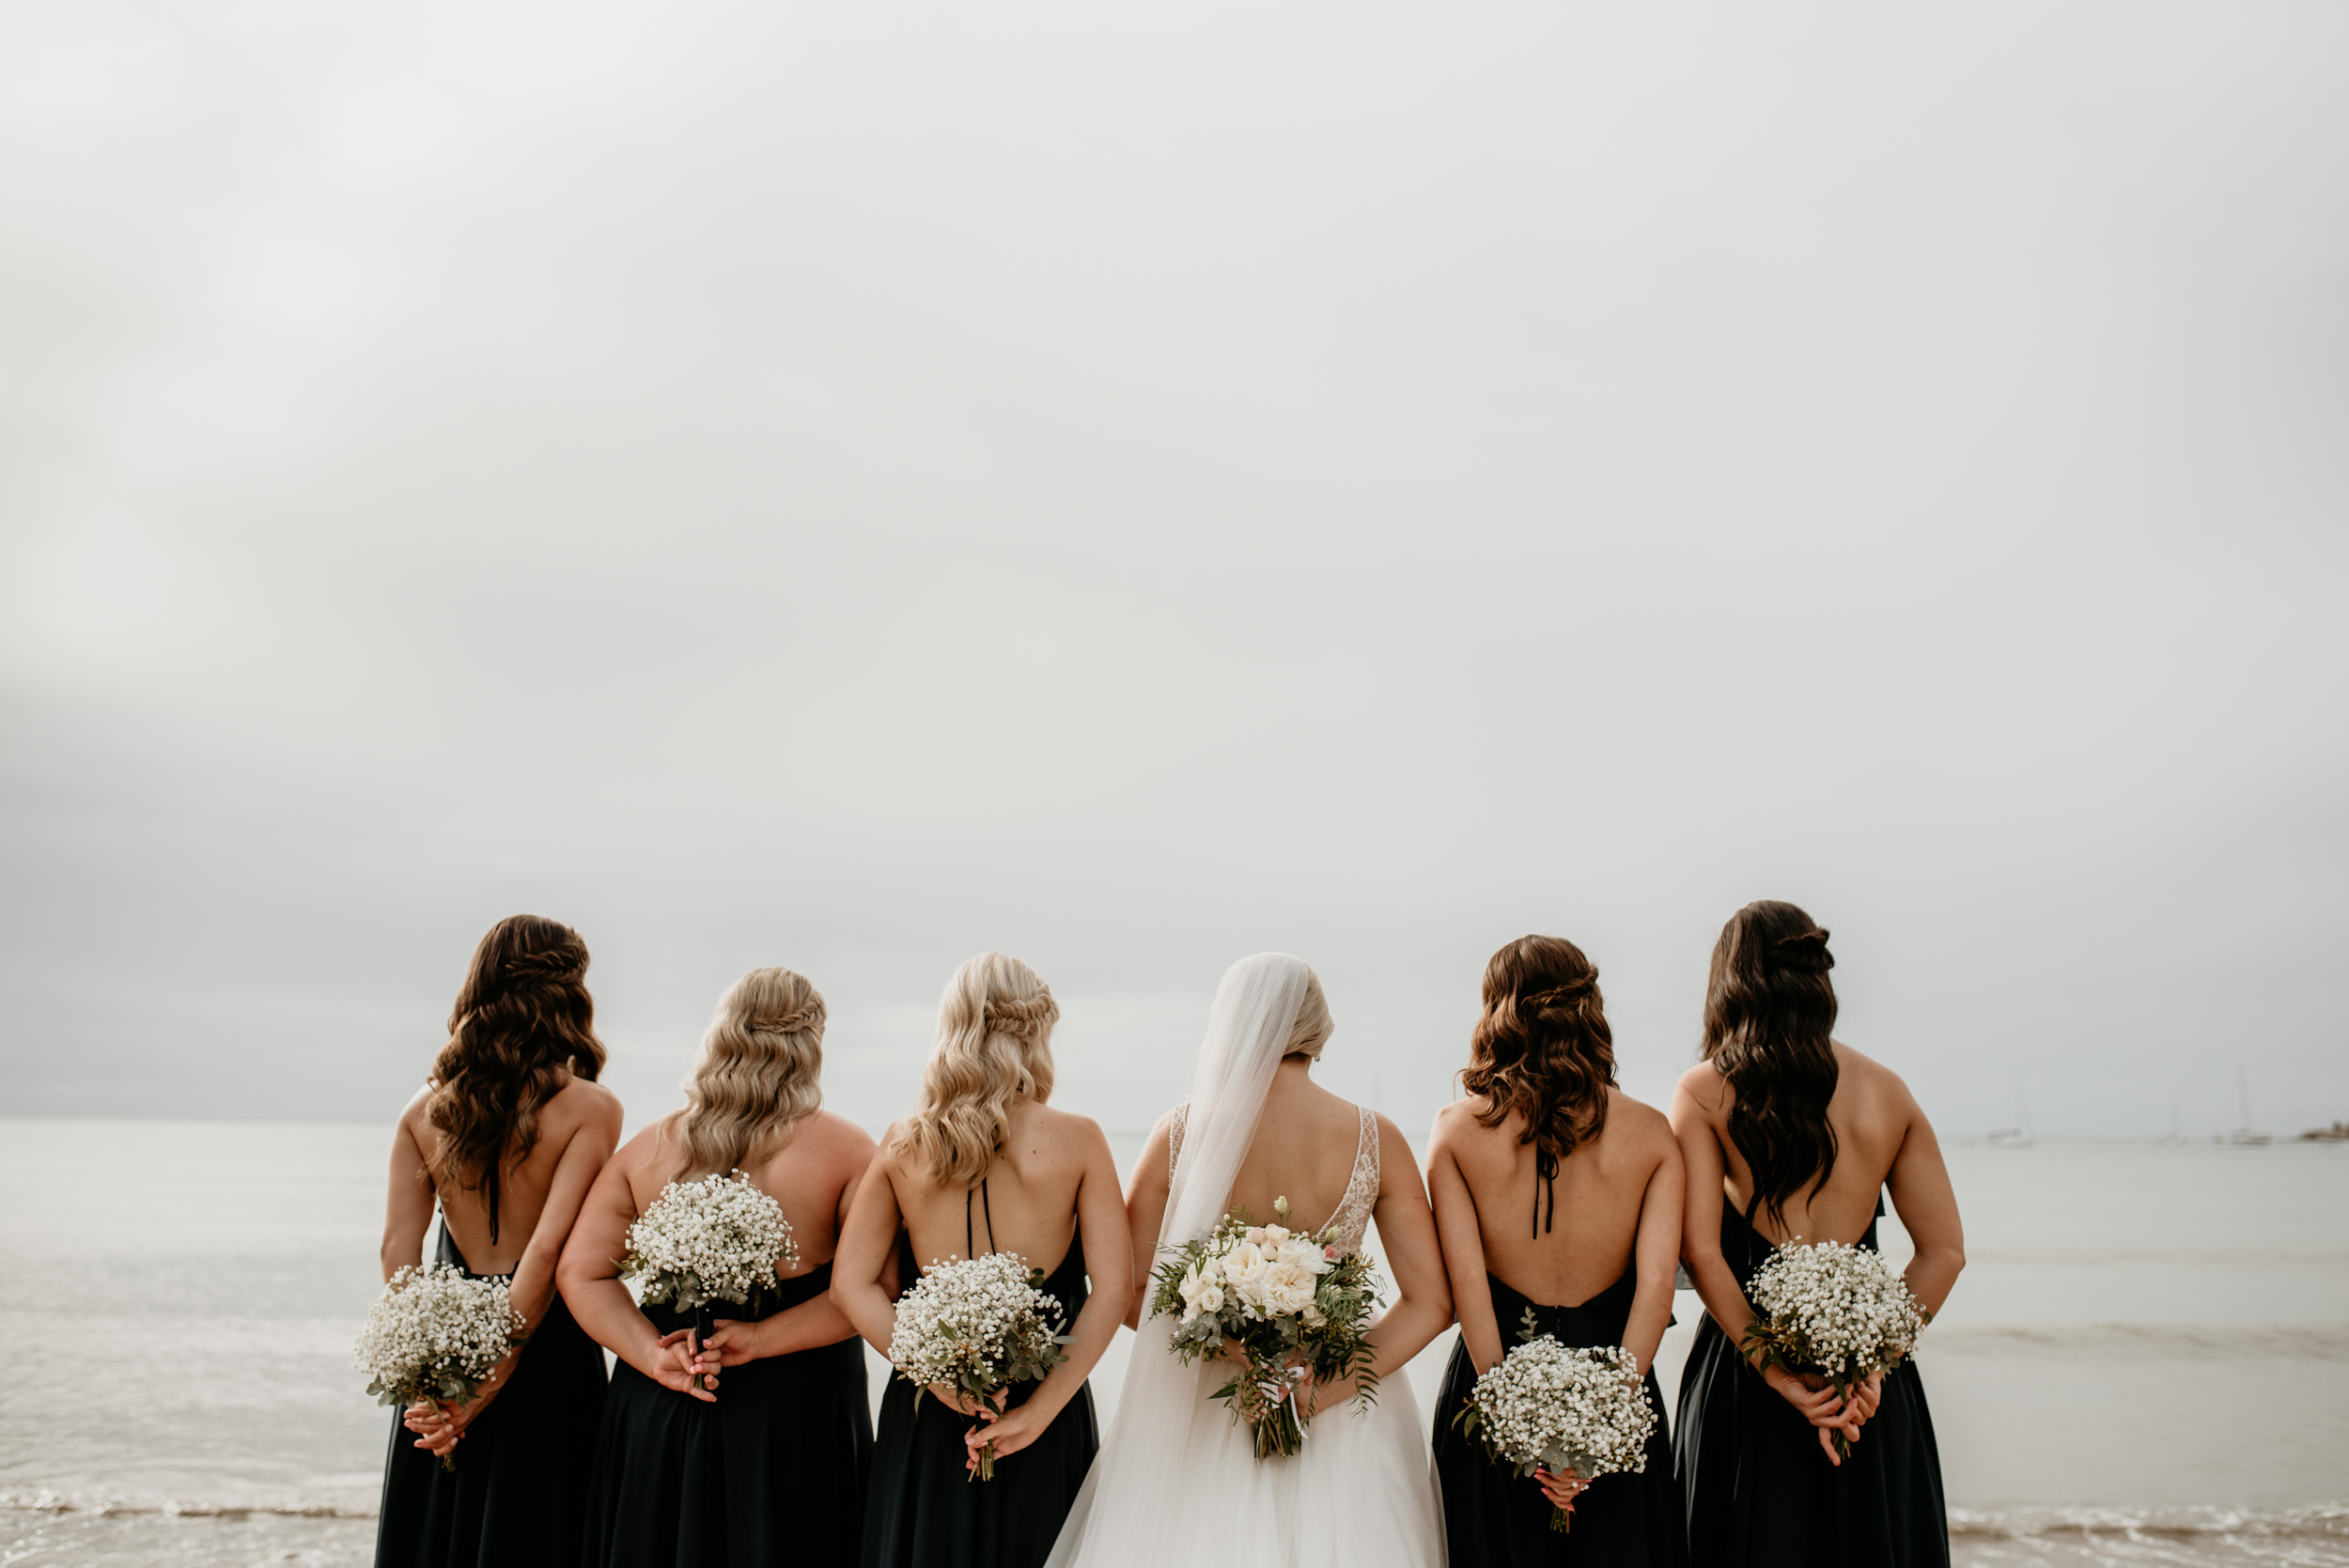 The Raw Photographer - Cairns and Port Douglas Wedding Photographer - Best of 2018-62.jpg